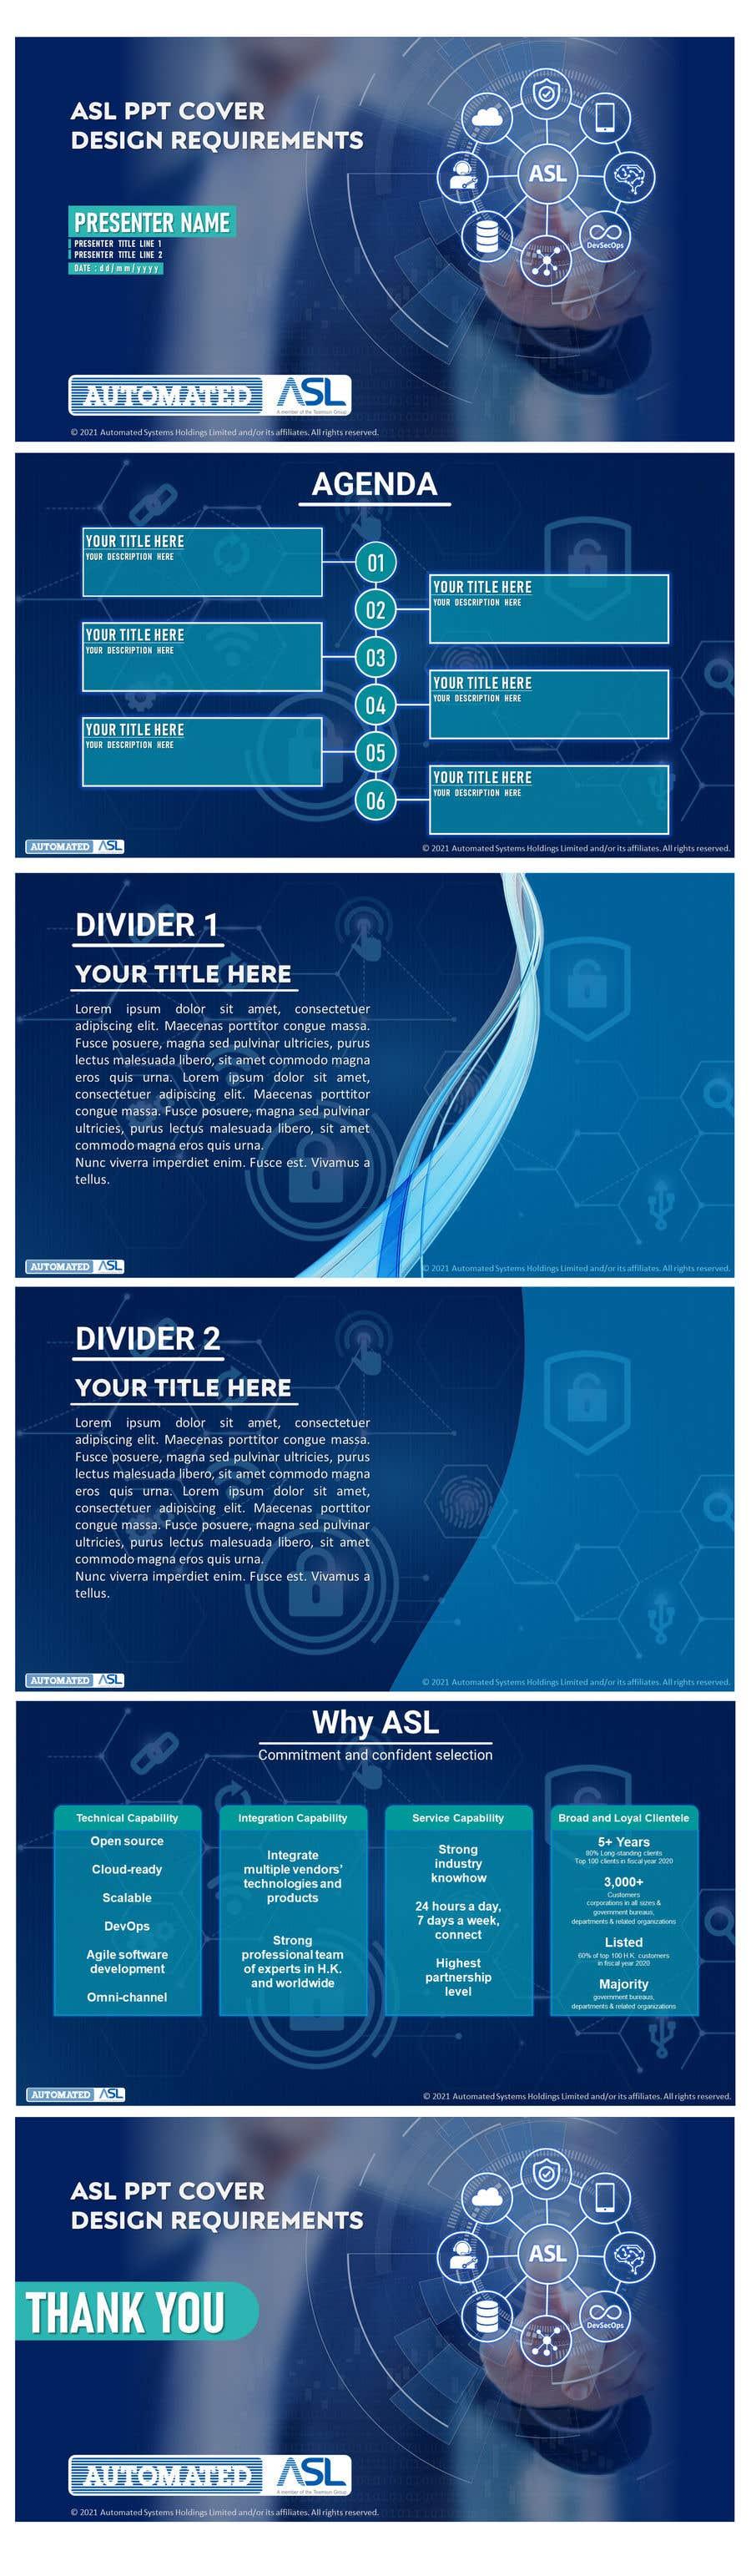 Bài tham dự cuộc thi #                                        42                                      cho                                         Corporate PPT Template Design (6 slides)